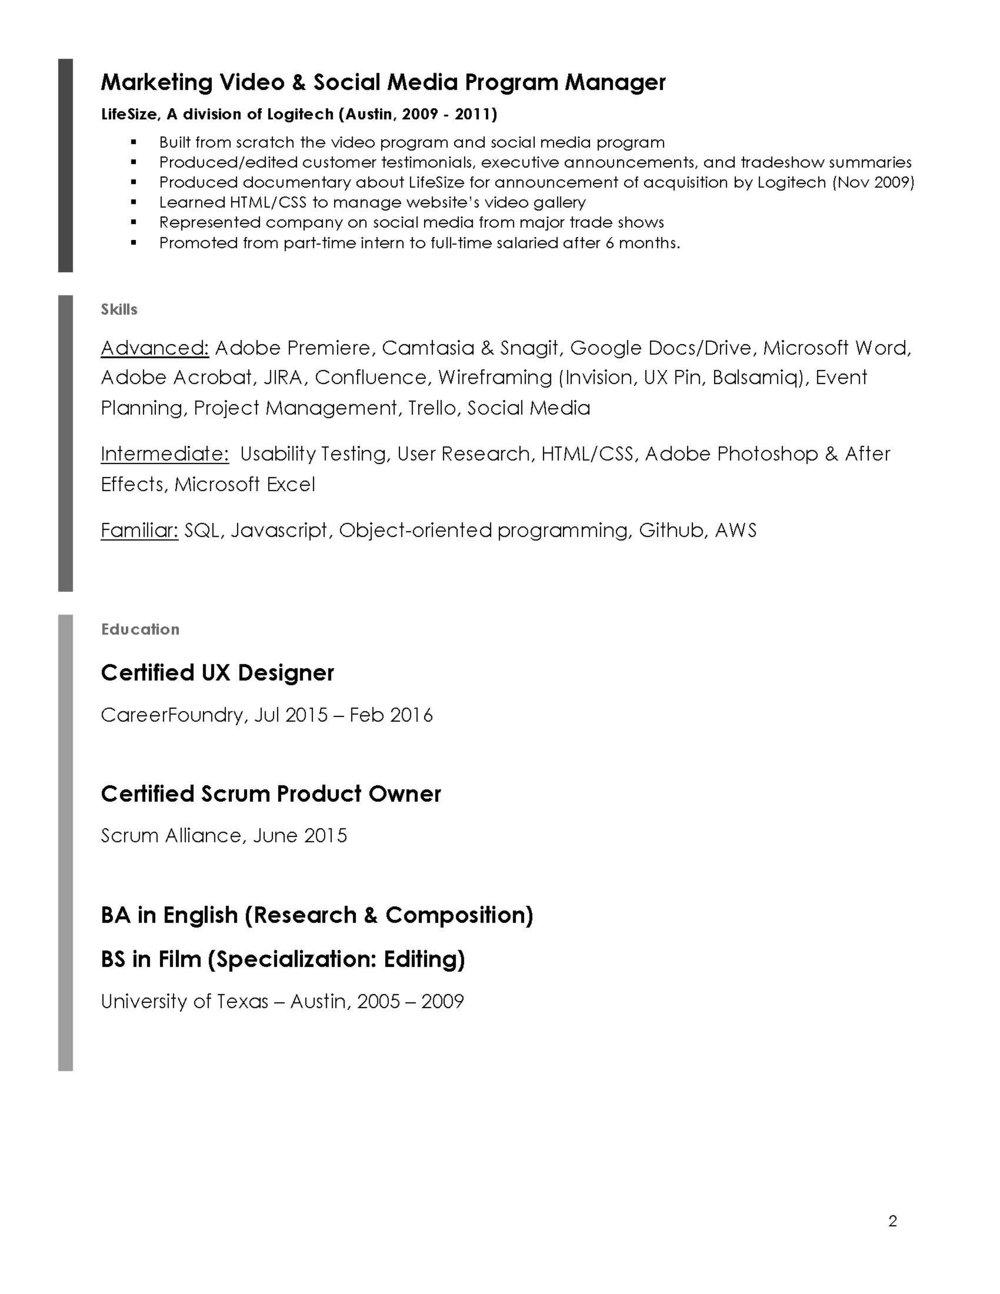 201701_Resume_Eshelman_Page_2.jpg